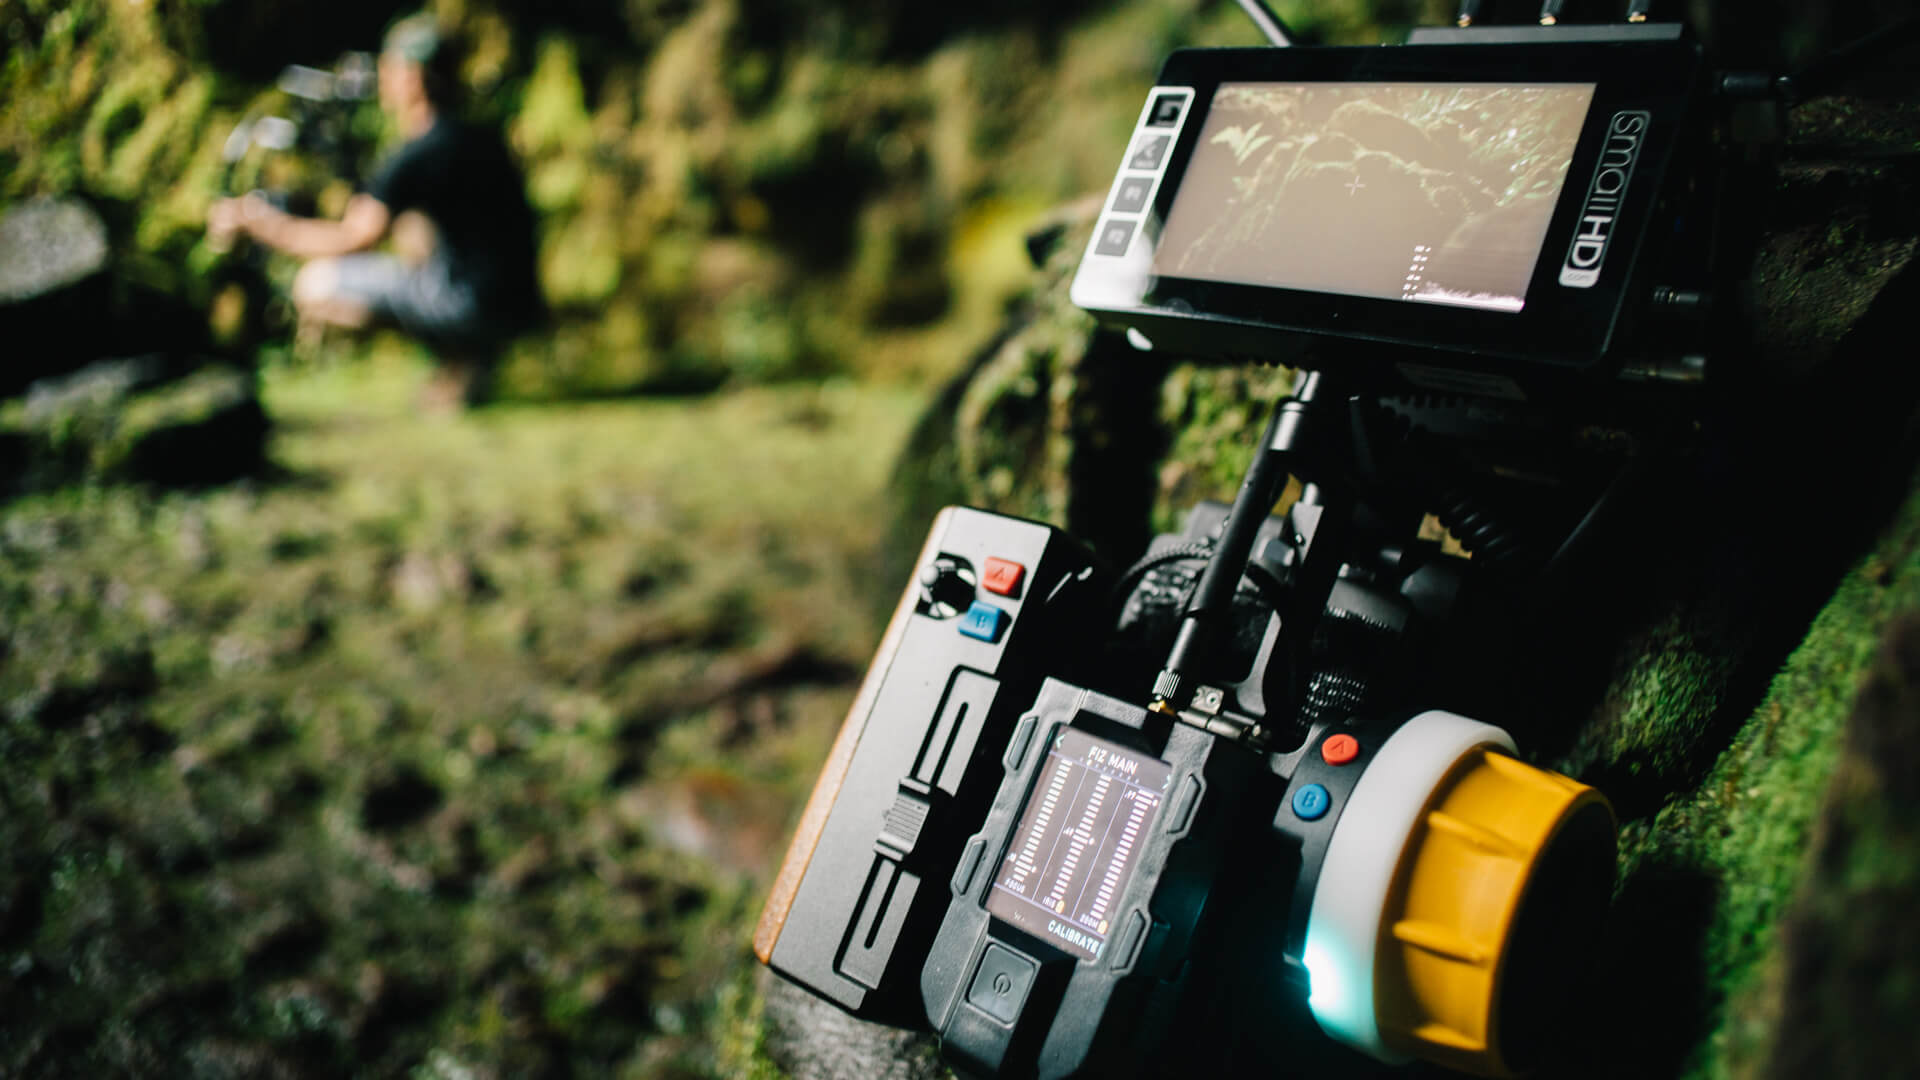 cinematographer-dp-sam-nuttmann-hawaii-ordinary-people-freefly-pilot-lens-control